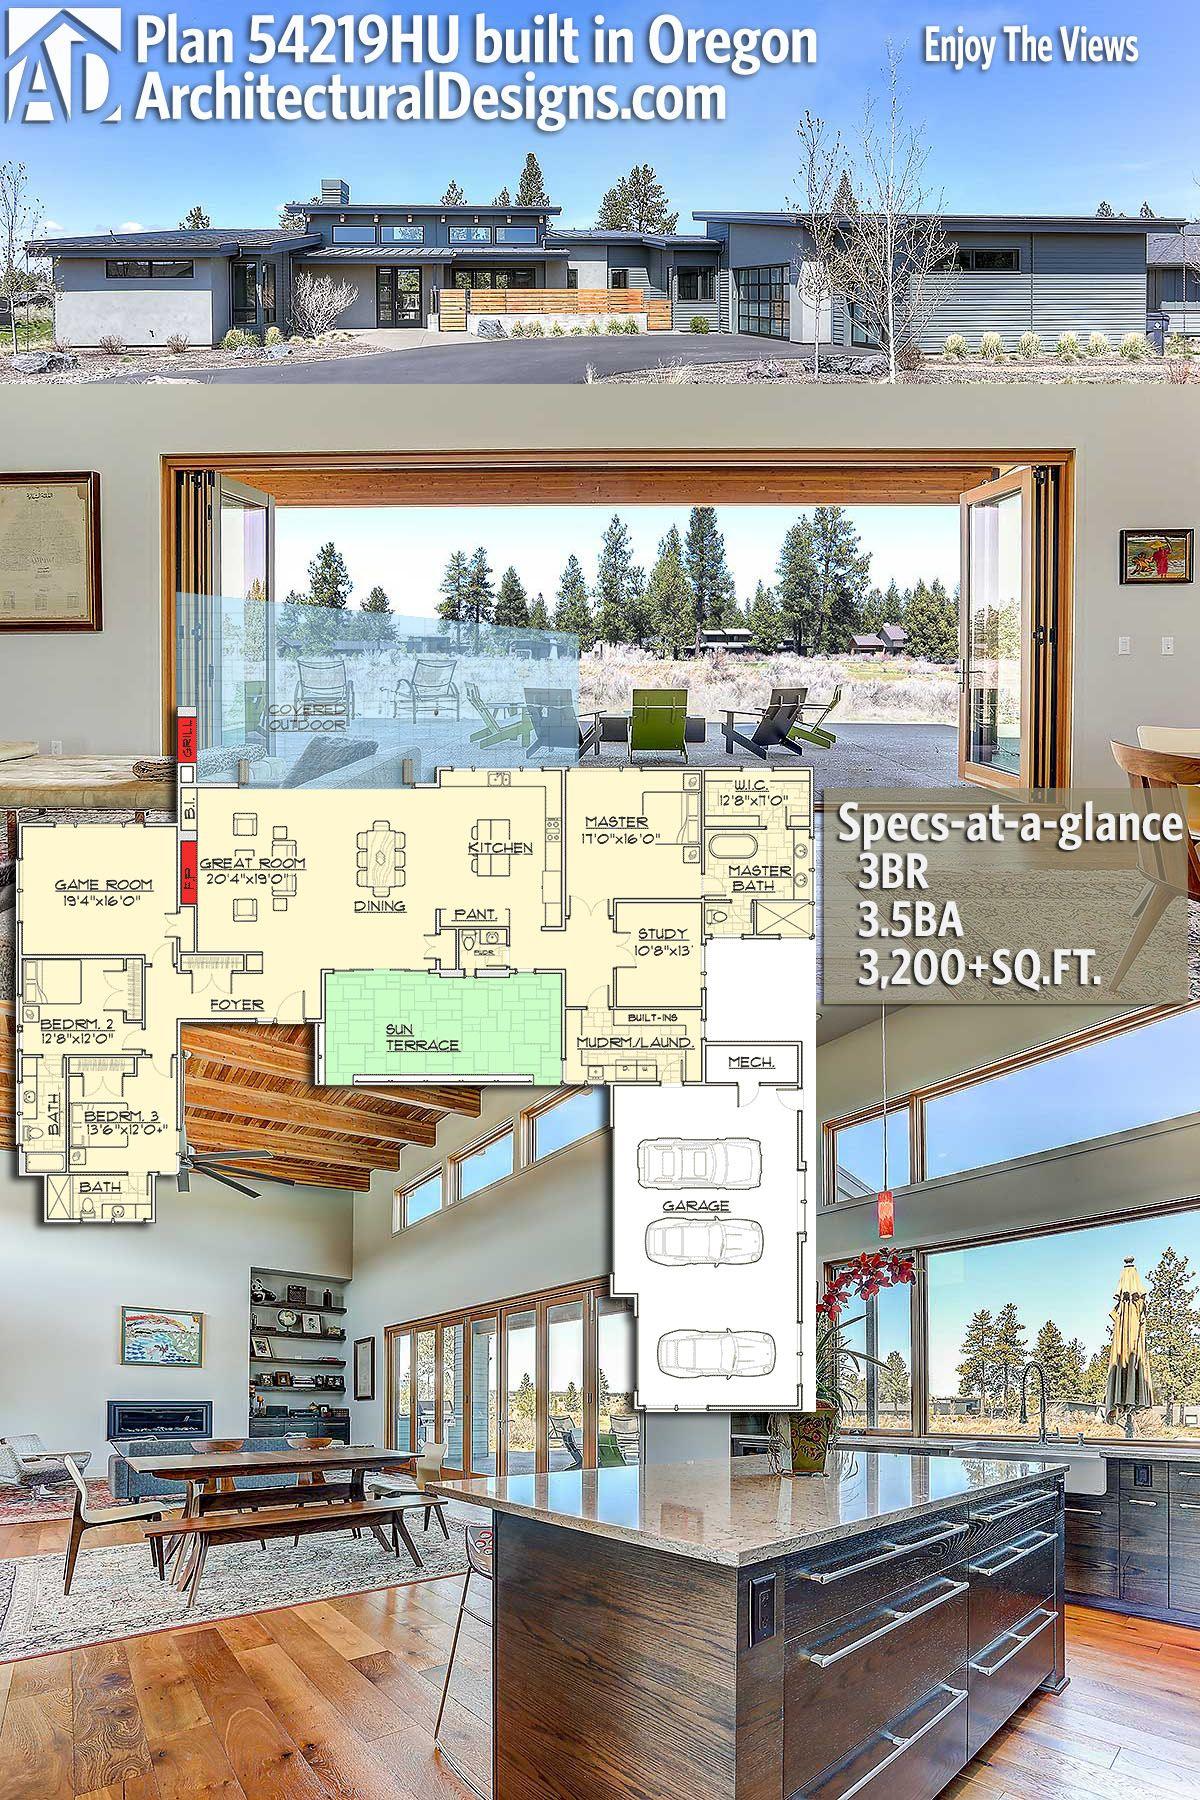 Architectural Designs House Plan 54219hu Called Enjoy The Views Has A Sun